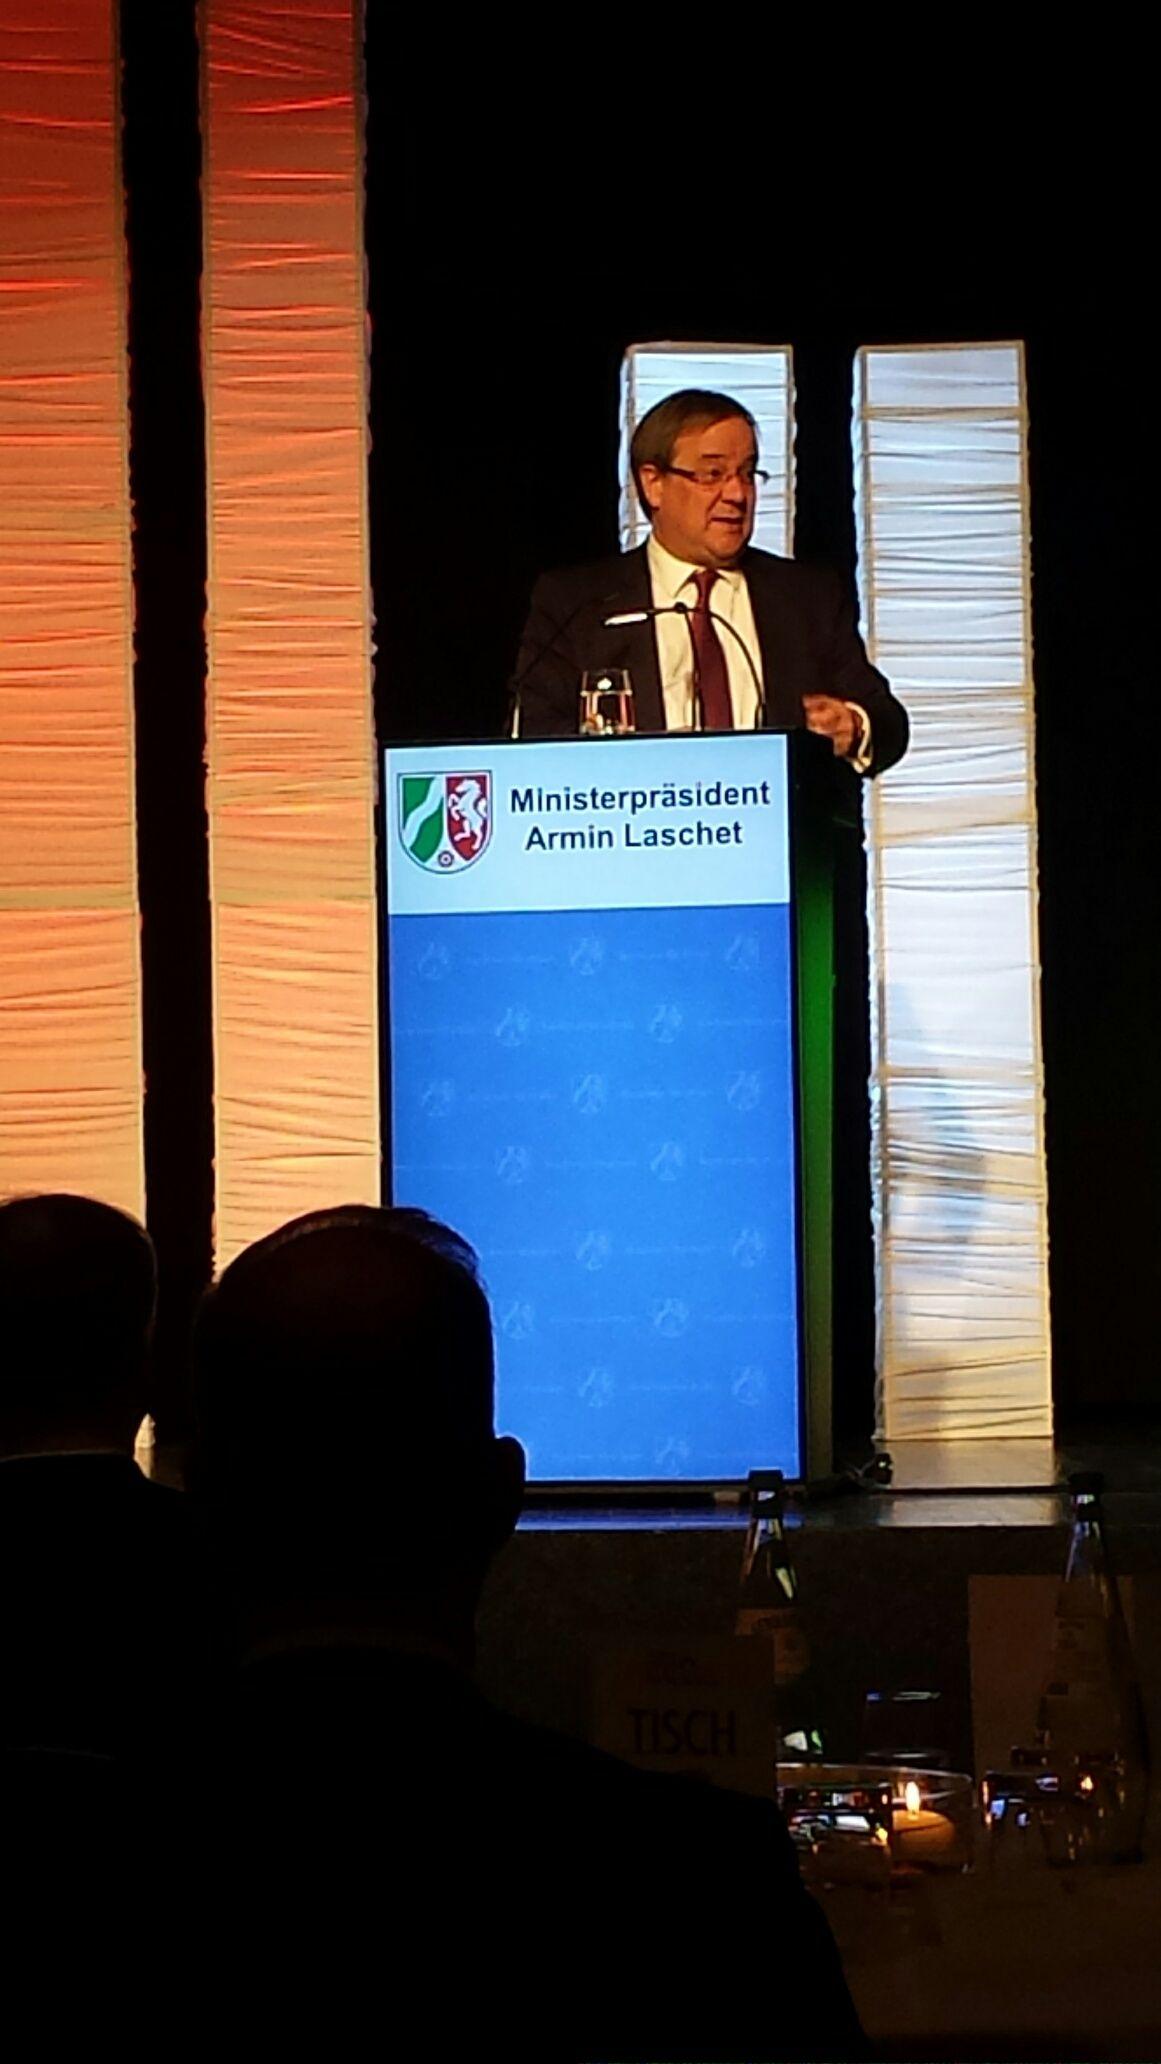 Ministerpräsident NRW Armin Laschet